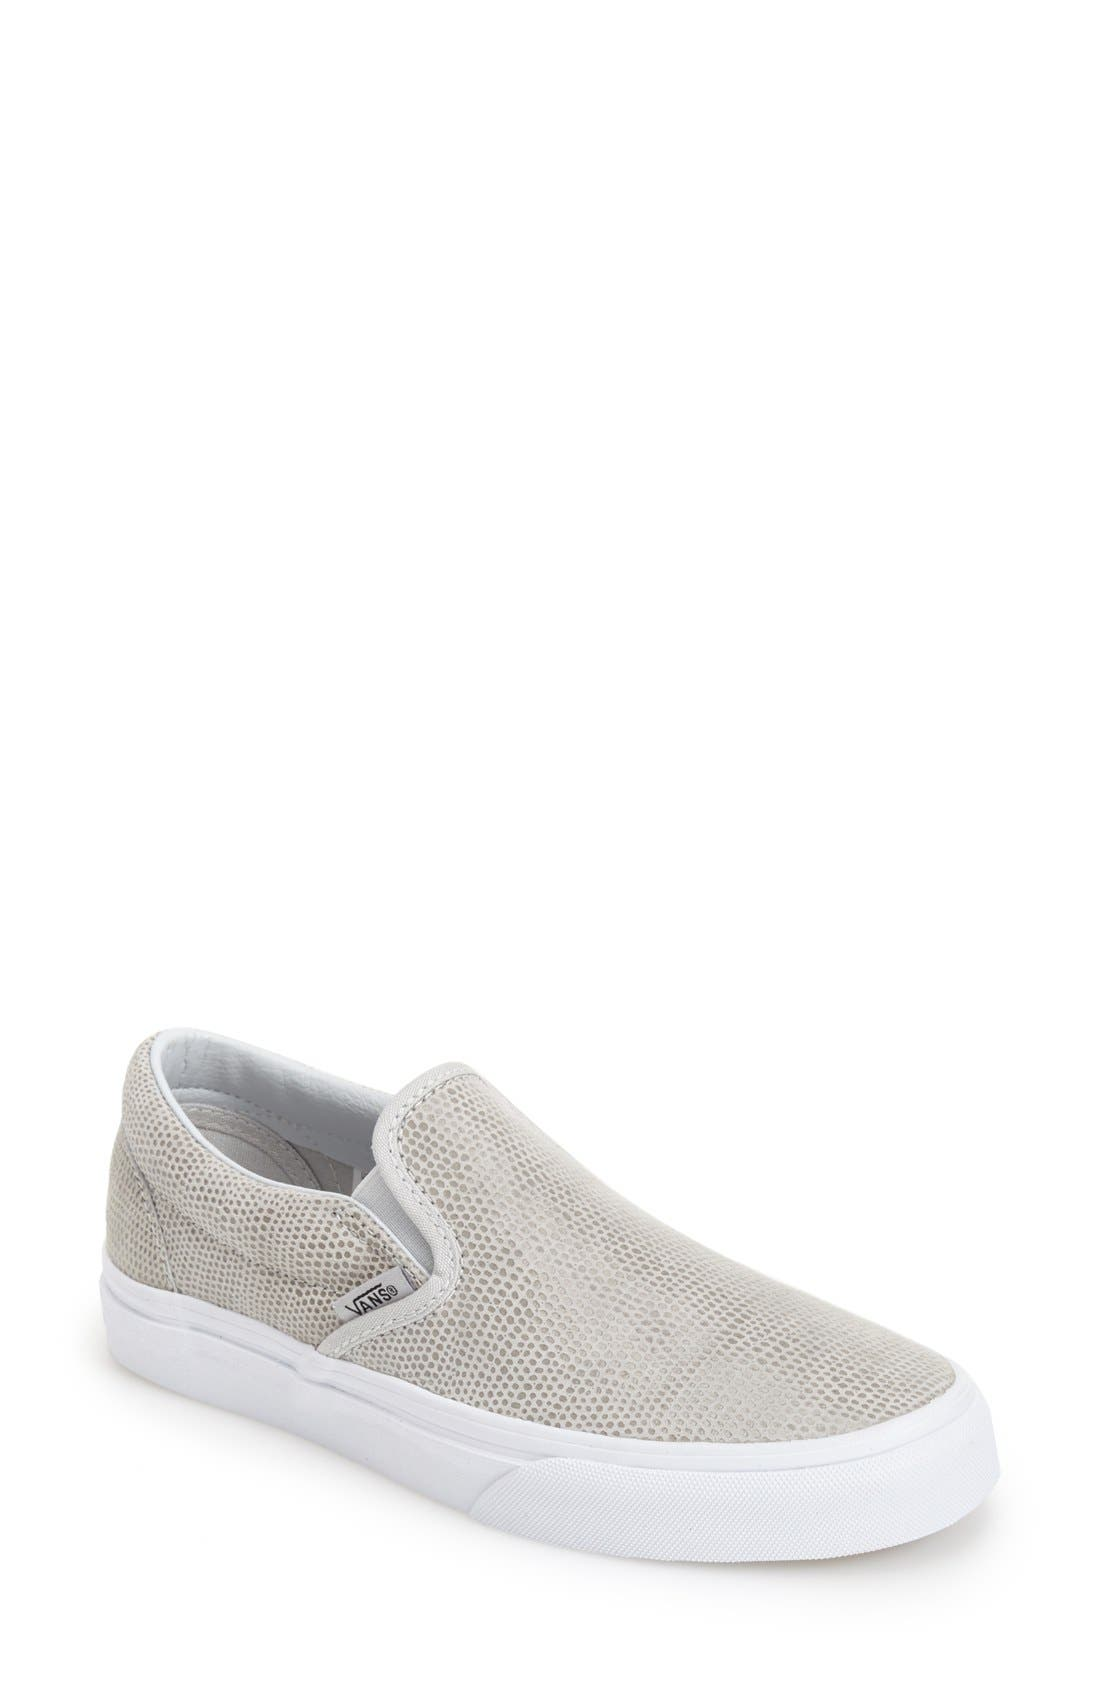 Alternate Image 1 Selected - Vans 'Pebble' Slip-On Sneaker (Women)